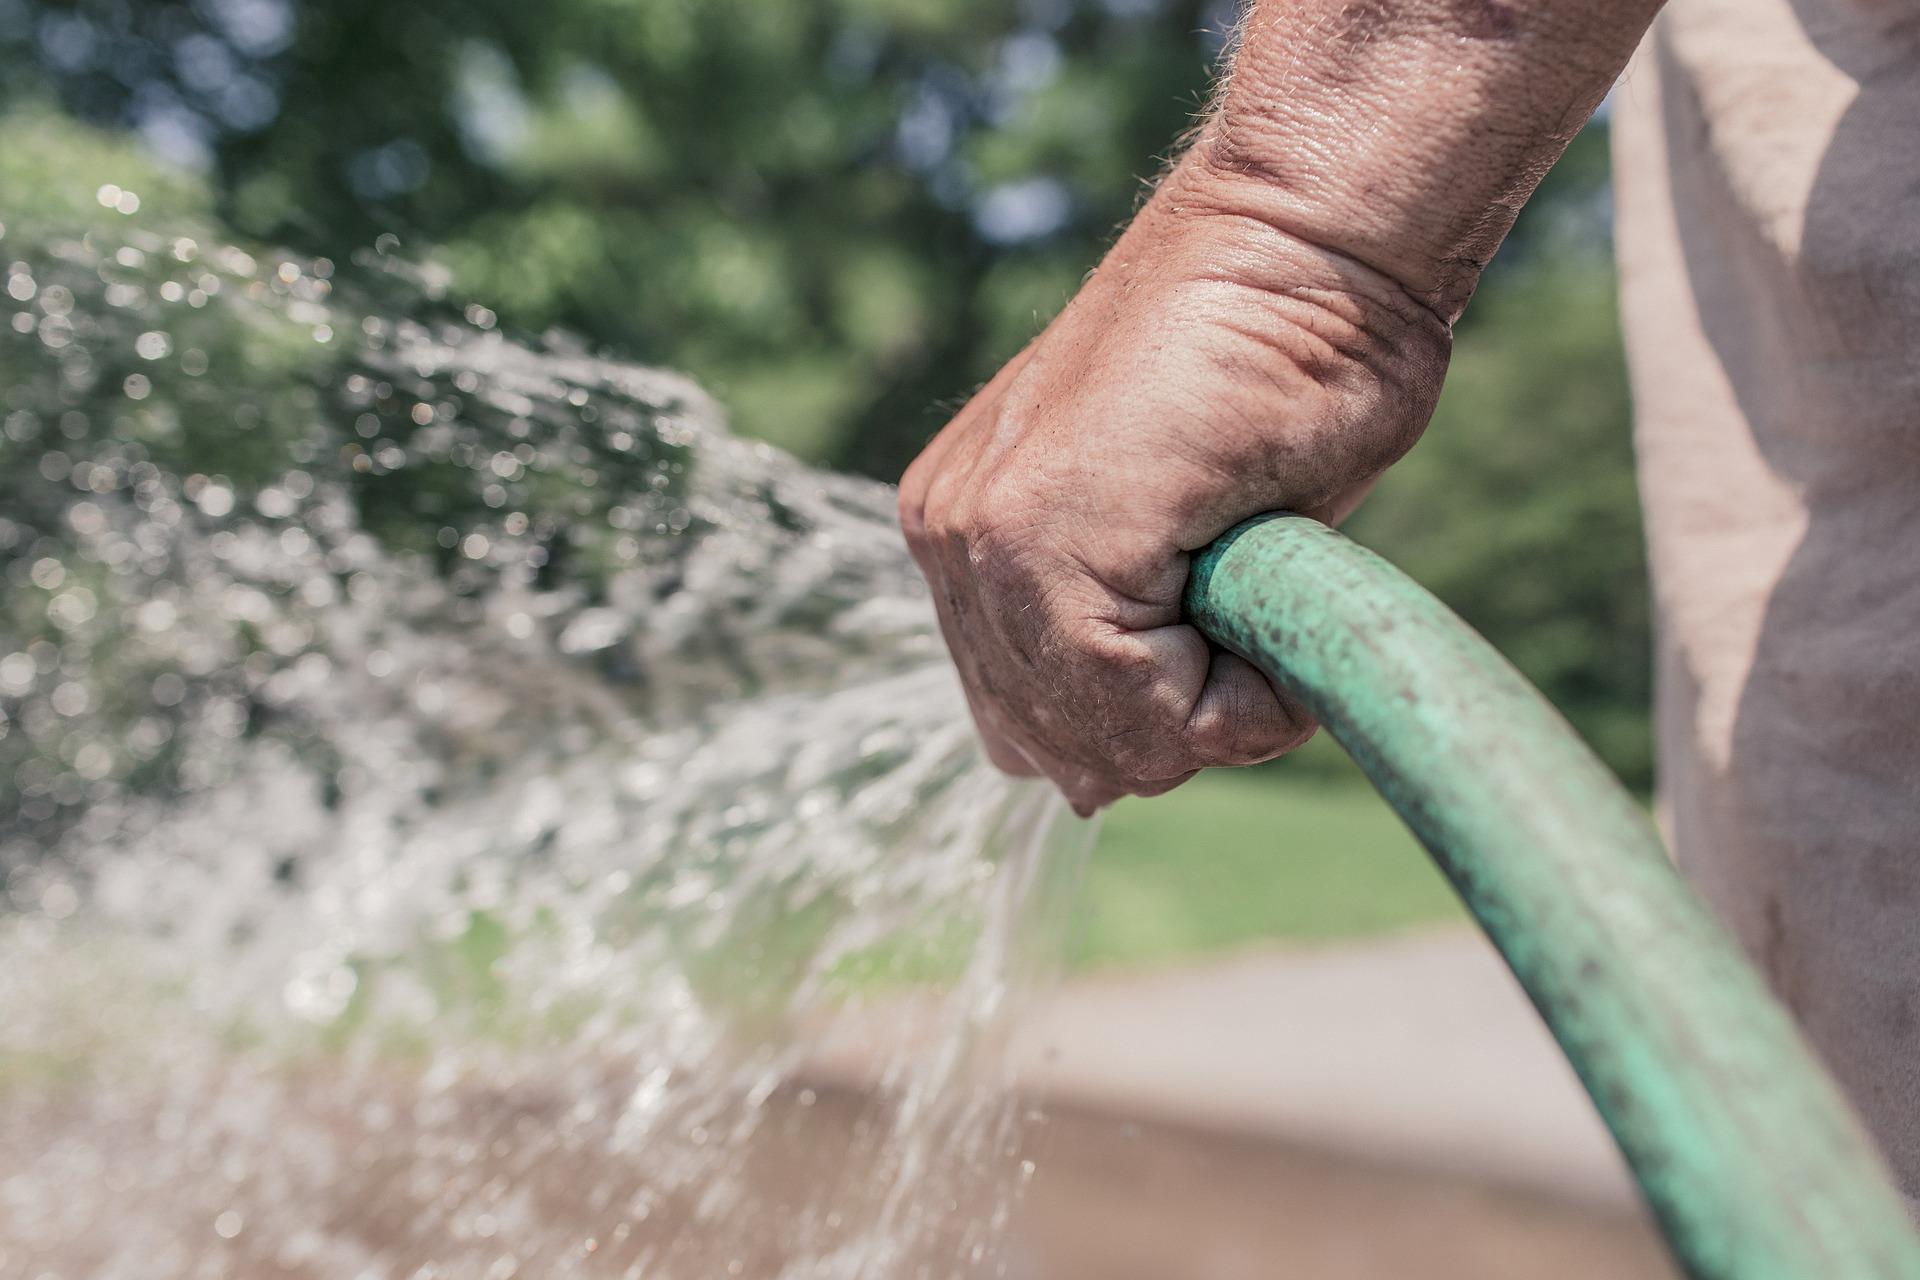 holding a spraying green hose